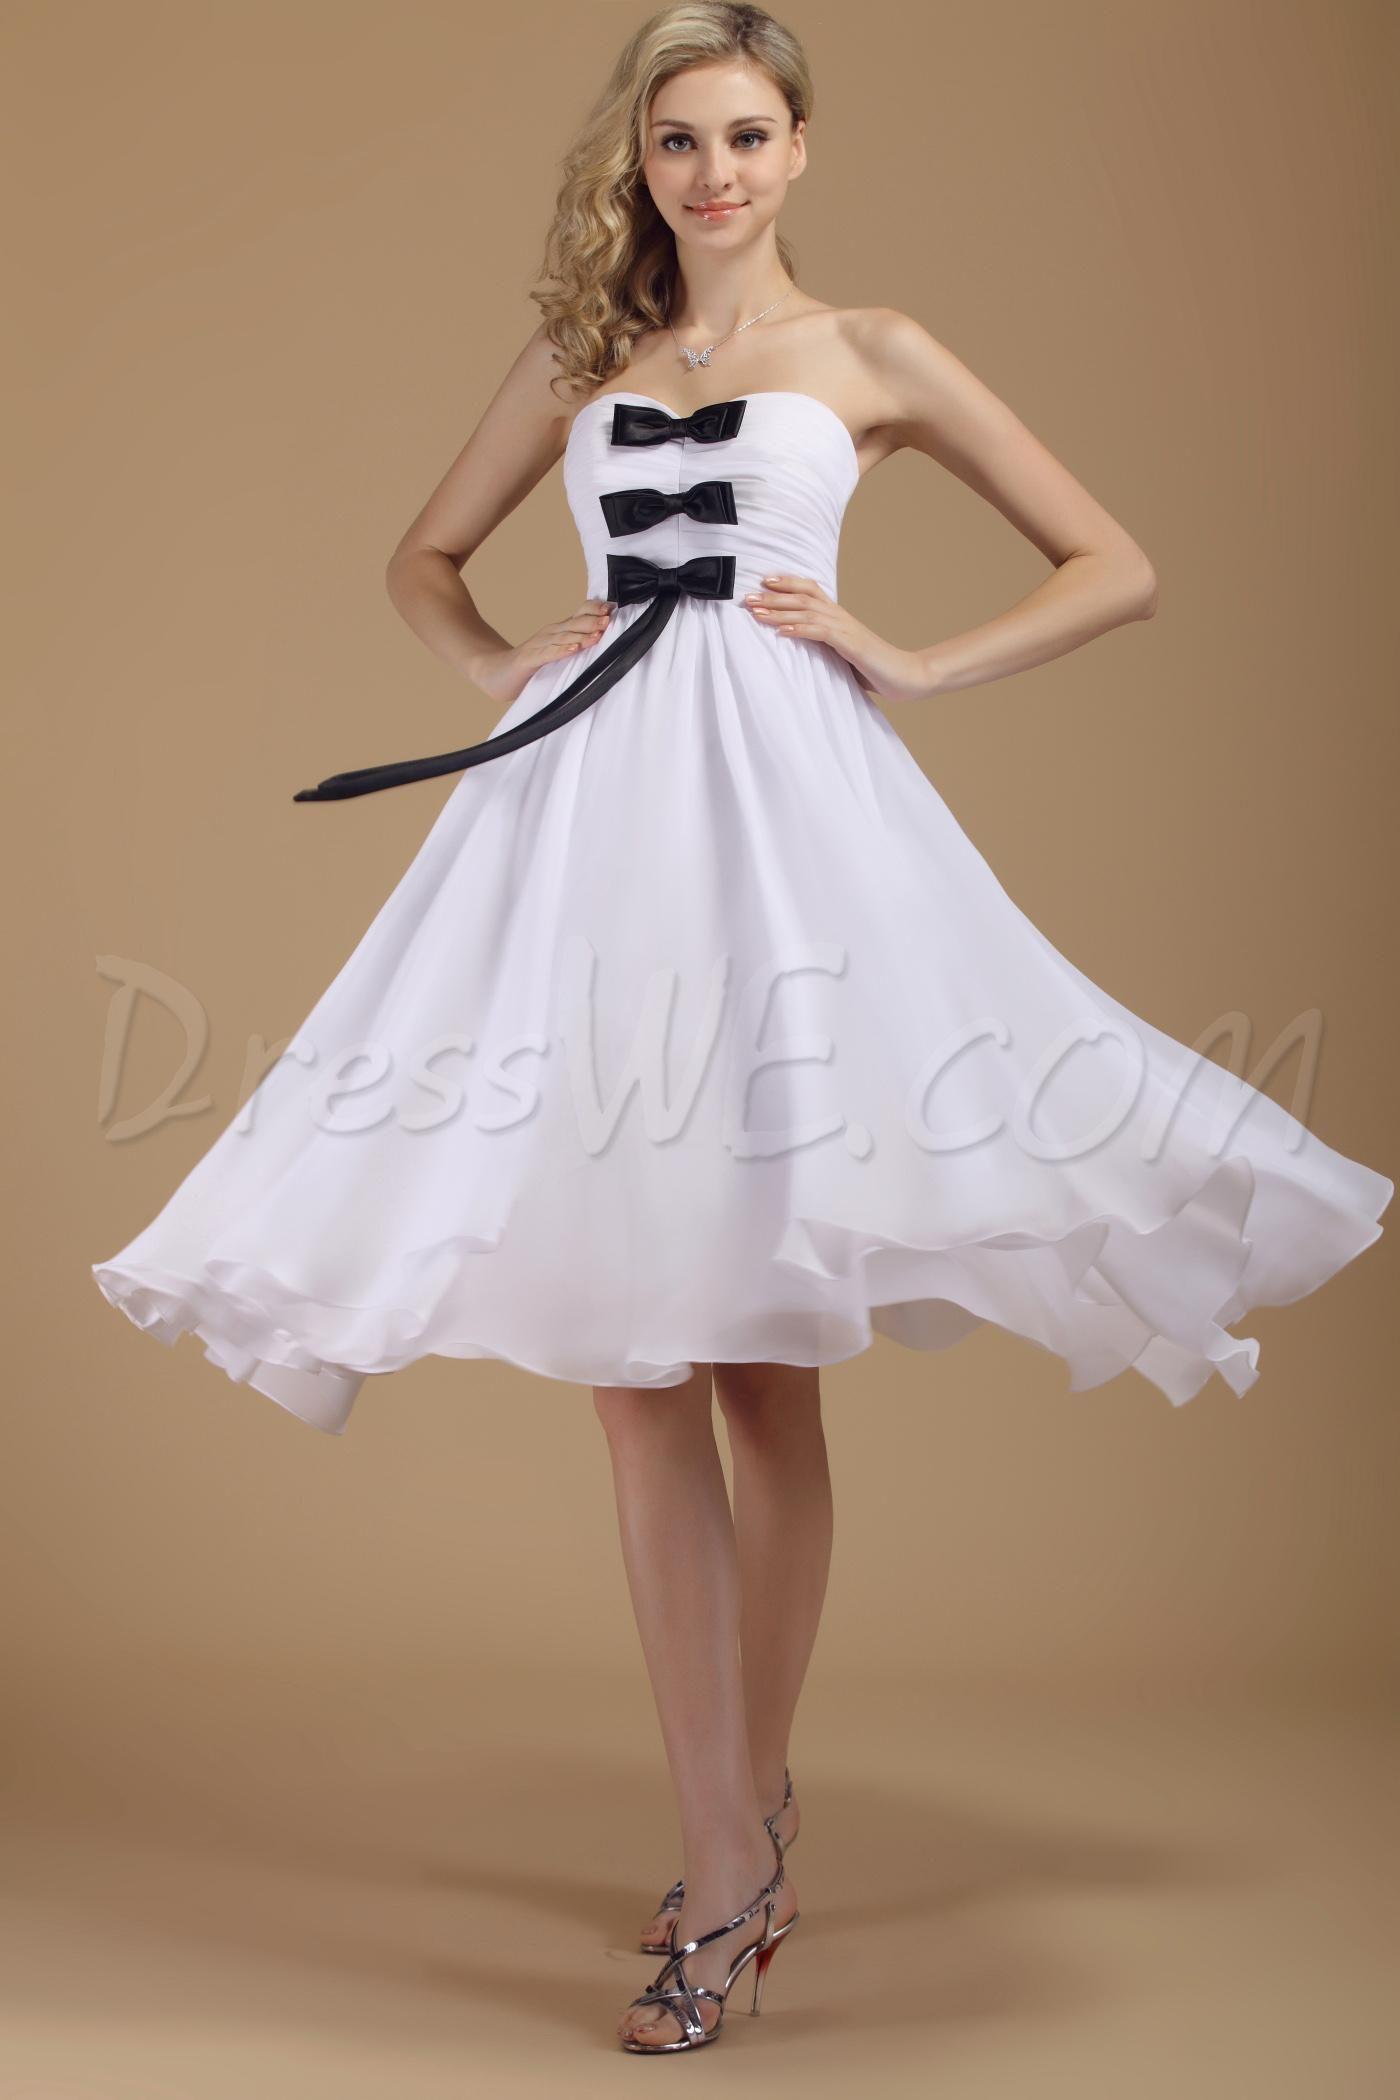 Tea length plus size wedding dresses   Dresswe SUPPLIES Concise Empire Sweetheart TeaLength